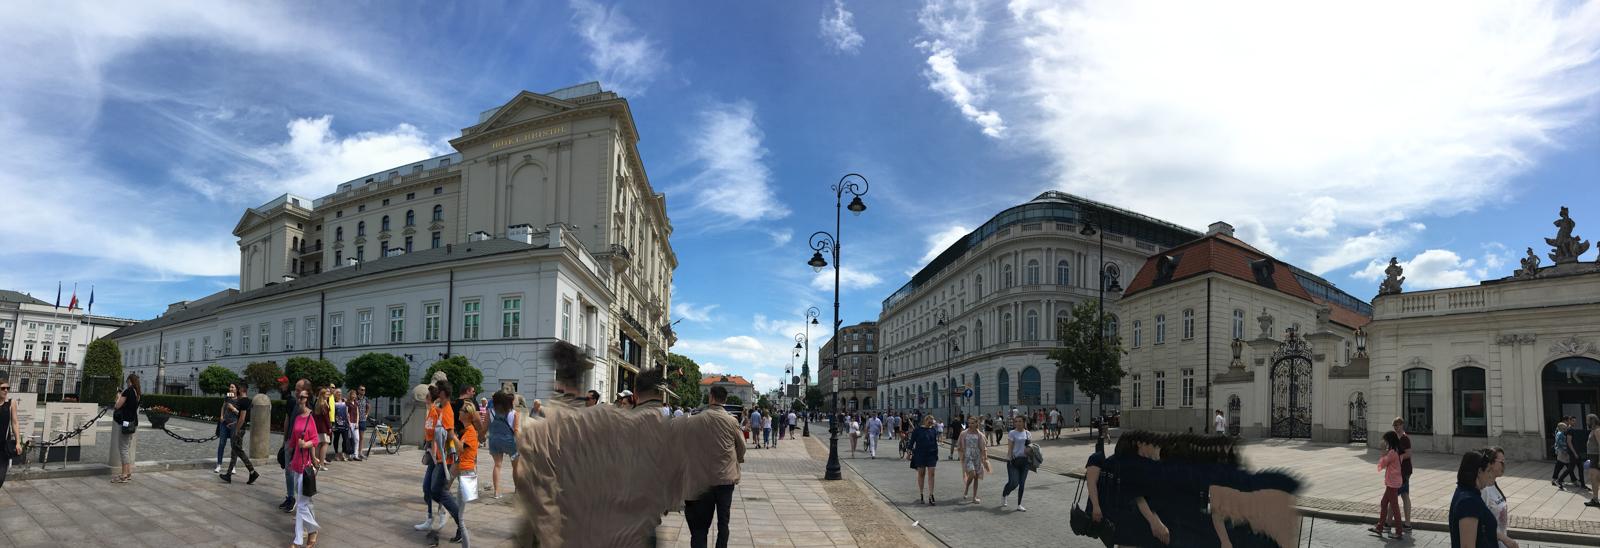 Poland_Germany_June2017-23.jpg